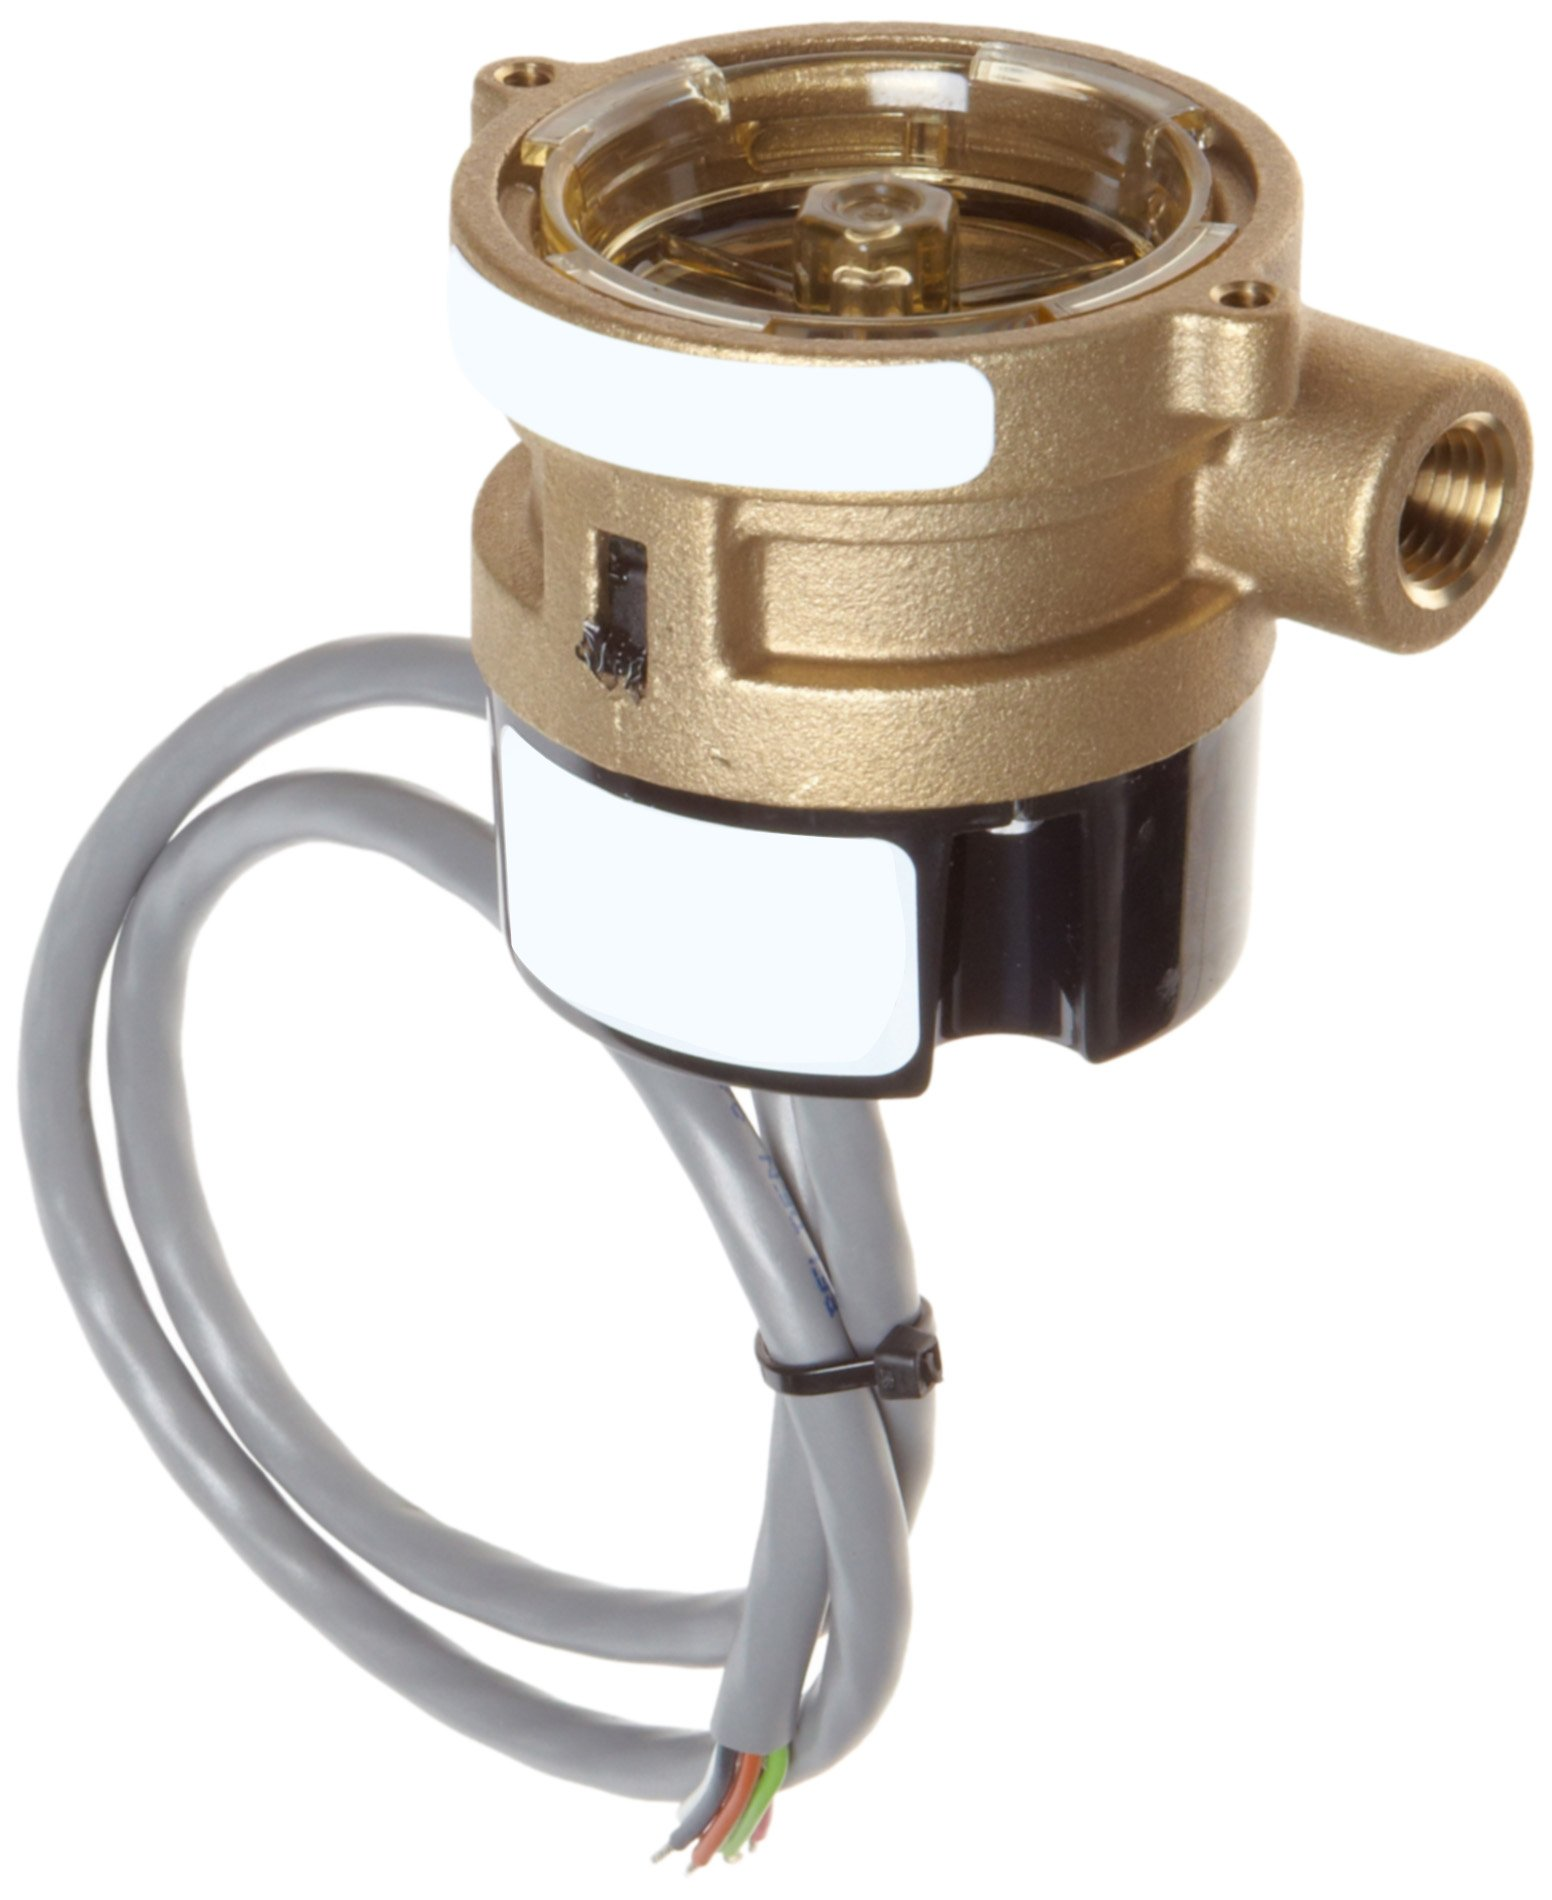 Gems Sensors RFS Series Brass Flow Sensor Switch, Inline, Rotor Type, 24 VDC Input, 0.1 - 5.0 gpm Flow Setting Adjustment Range, 1/4'' NPT Female